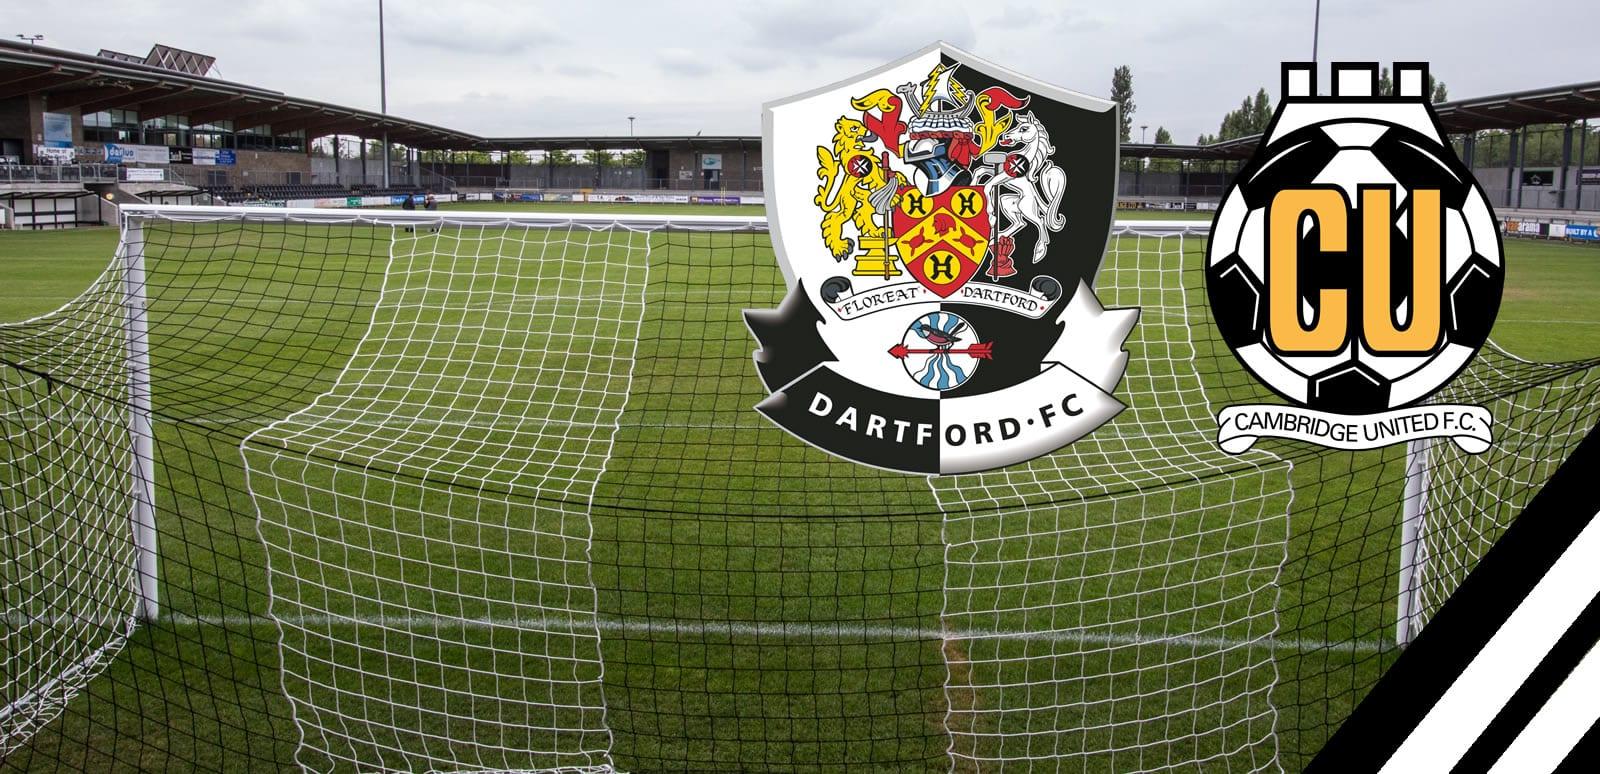 Match Information – Dartford FC vs Cambridge United